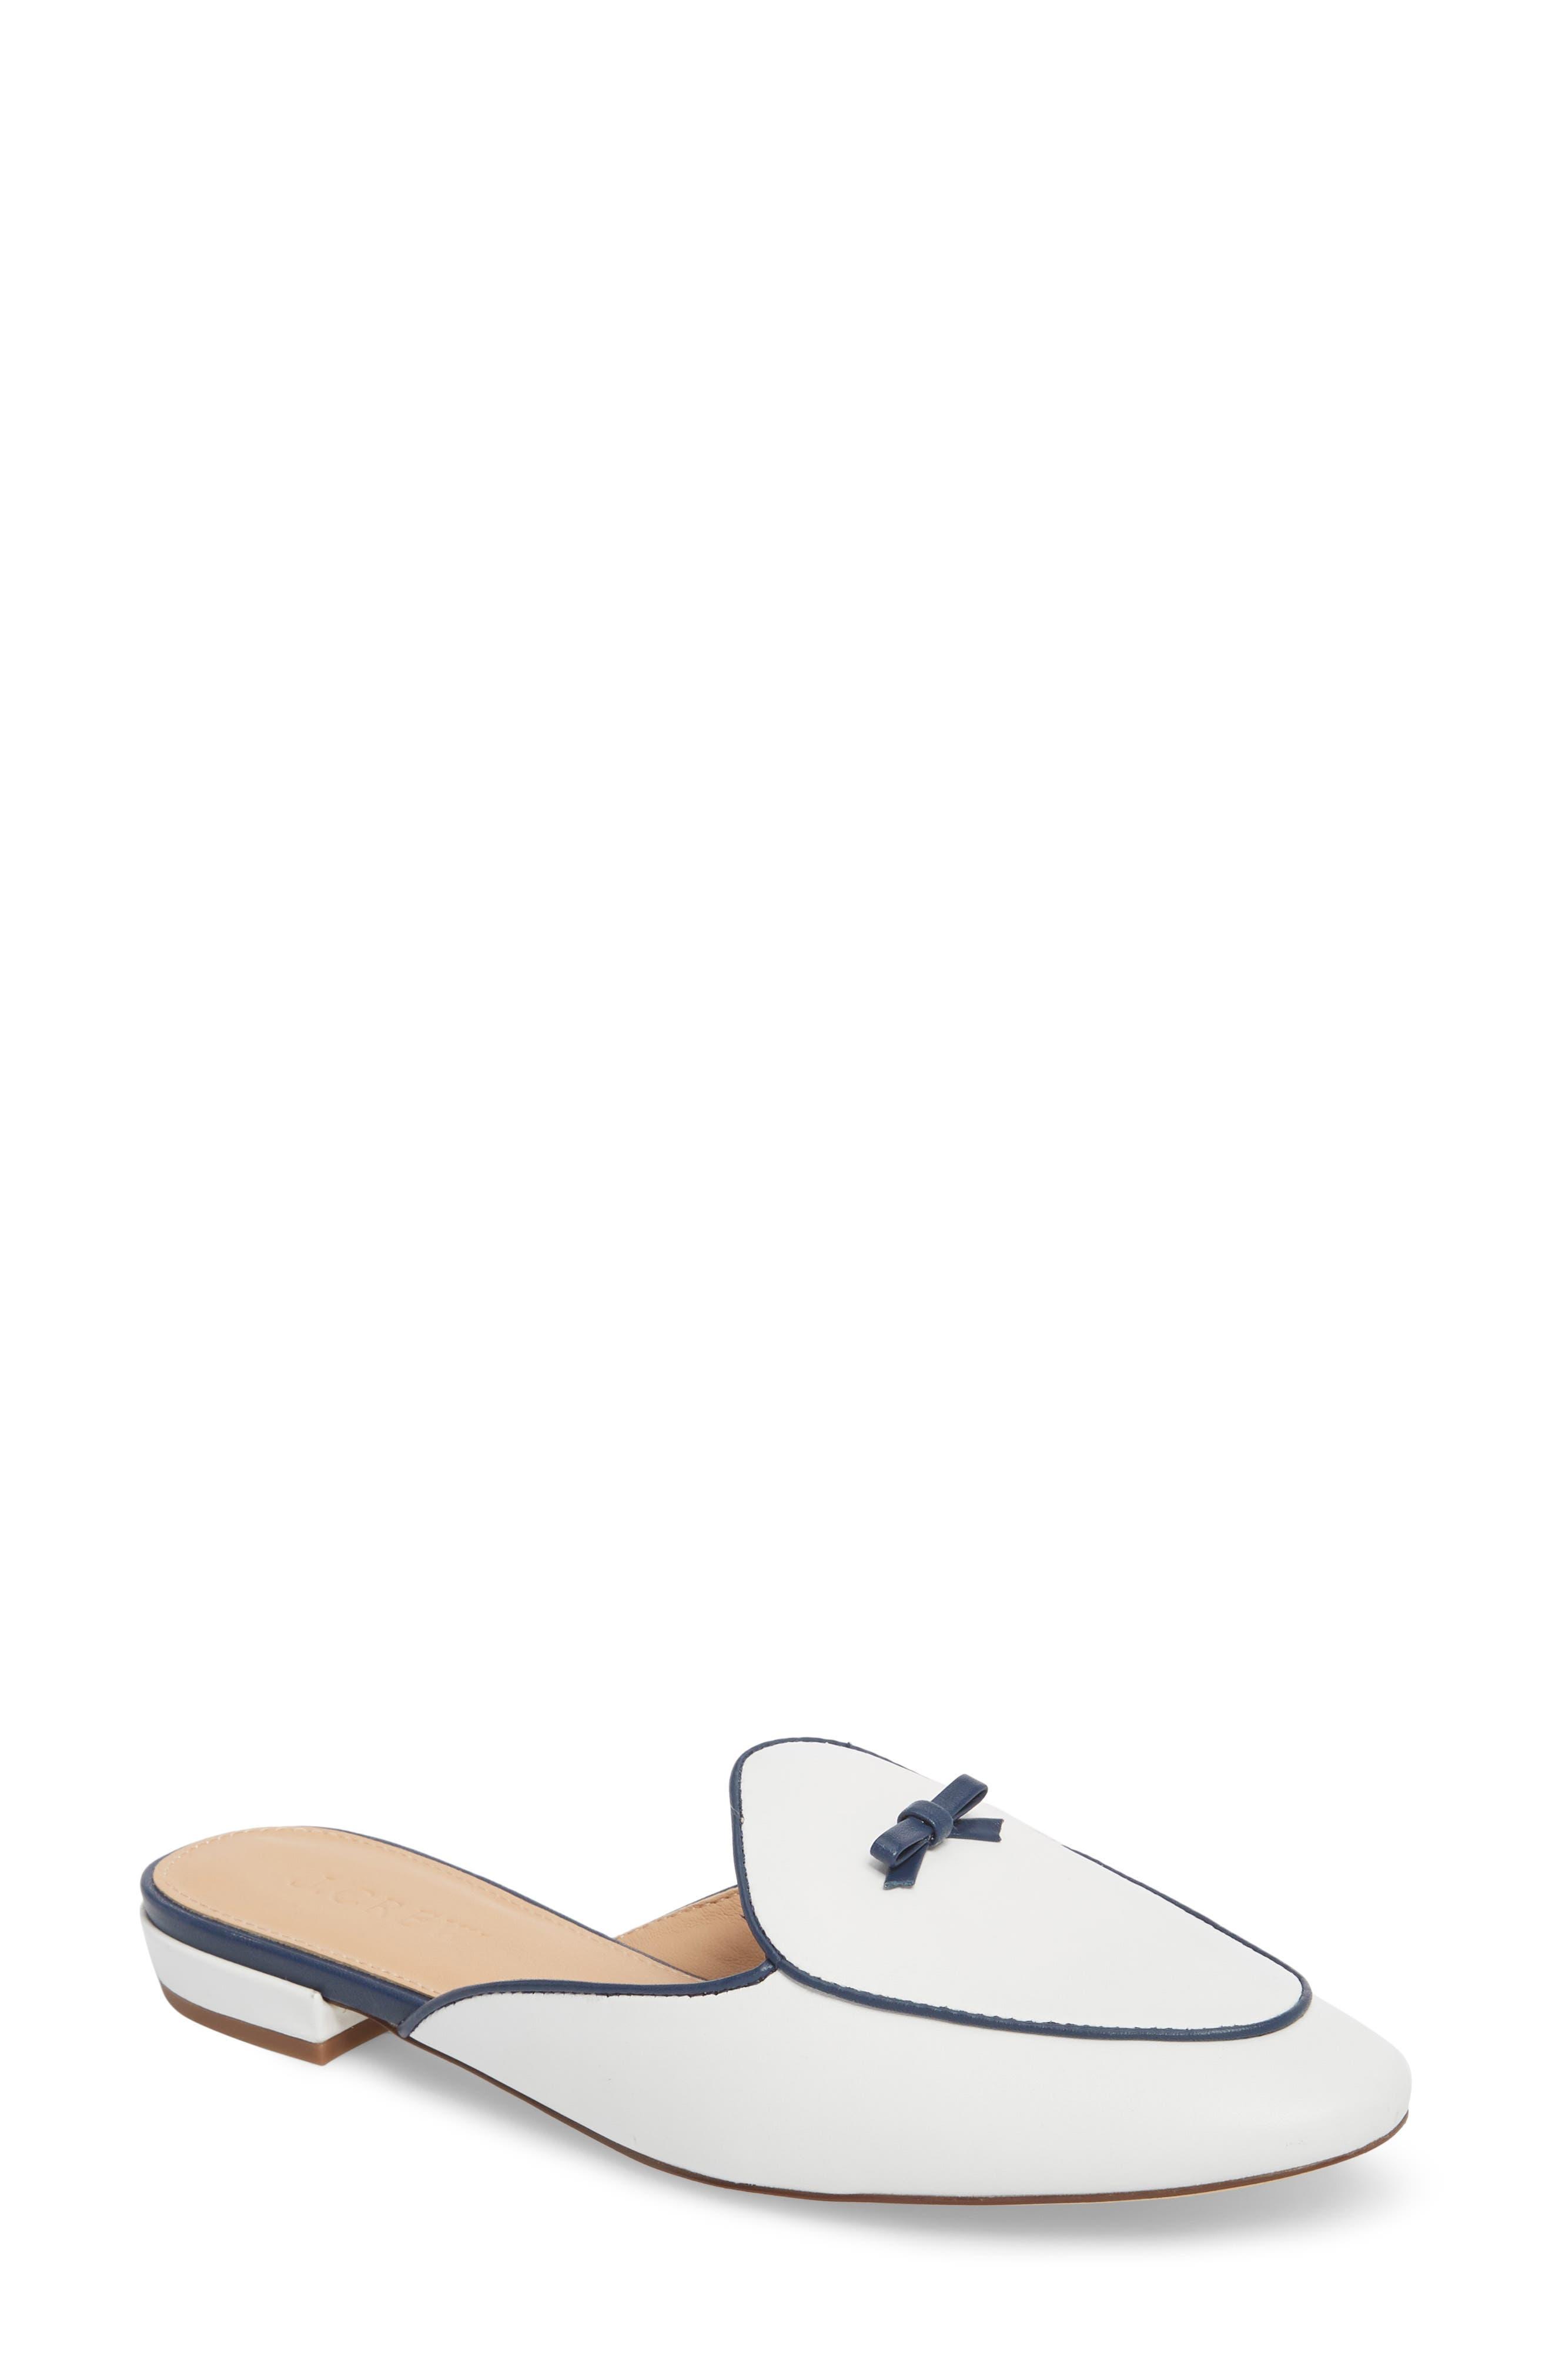 Loafer Mule,                         Main,                         color, 100